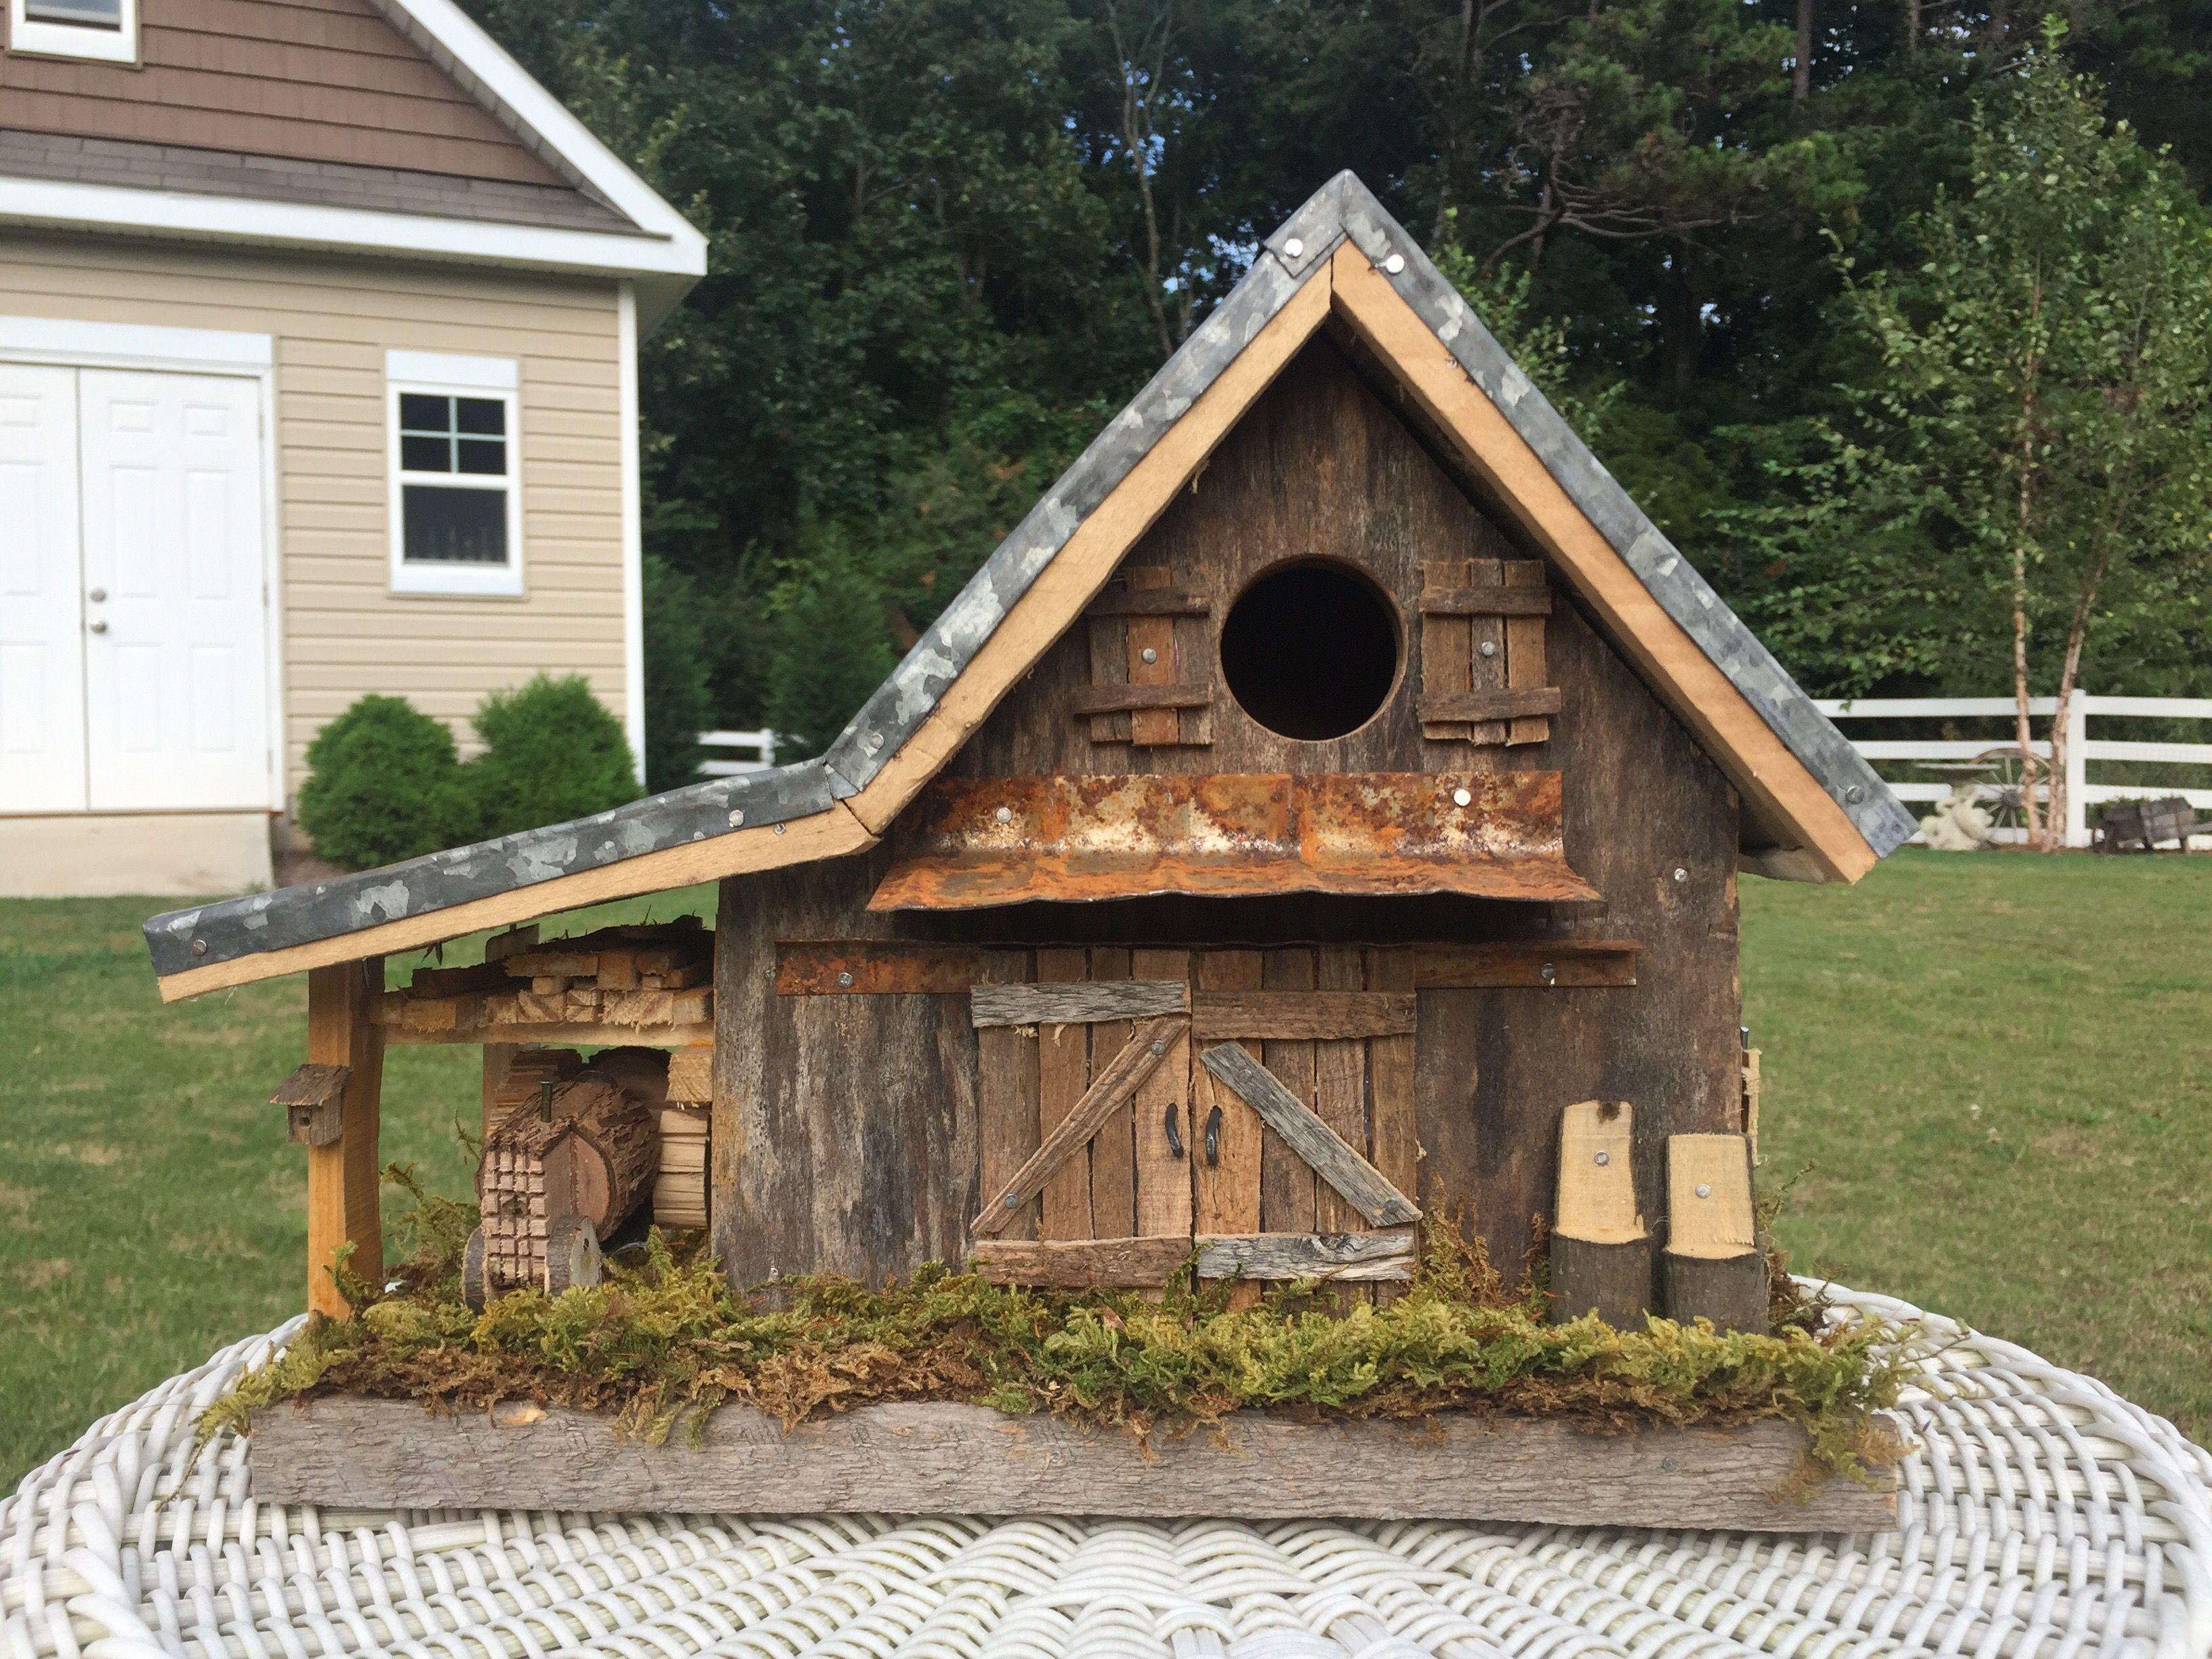 Stupendous Rustic Barn Birdhouse Birdhouse Ideas Decorative Bird Download Free Architecture Designs Scobabritishbridgeorg